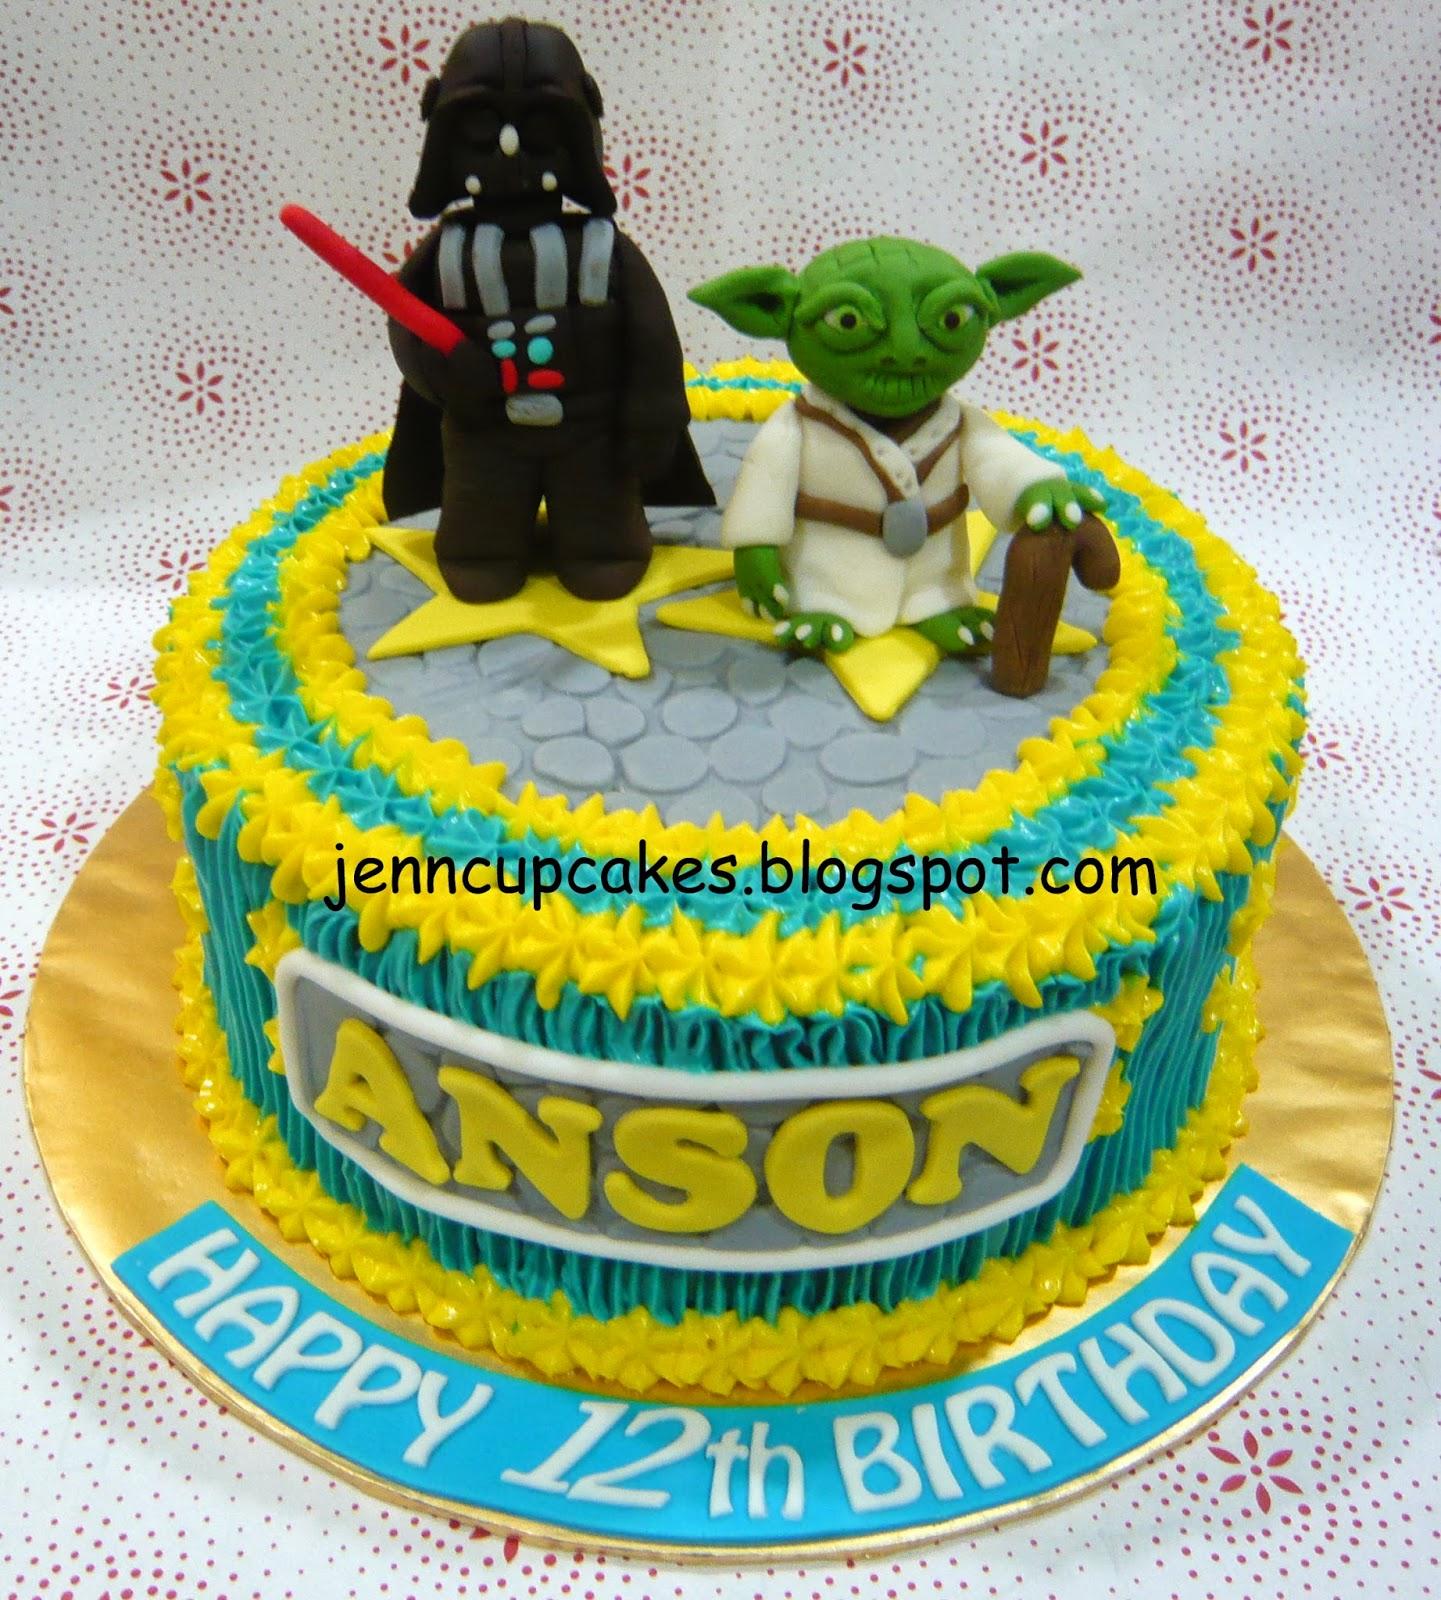 Jenn Cupcakes Muffins Star Wars Cake Yoda Darth Vader